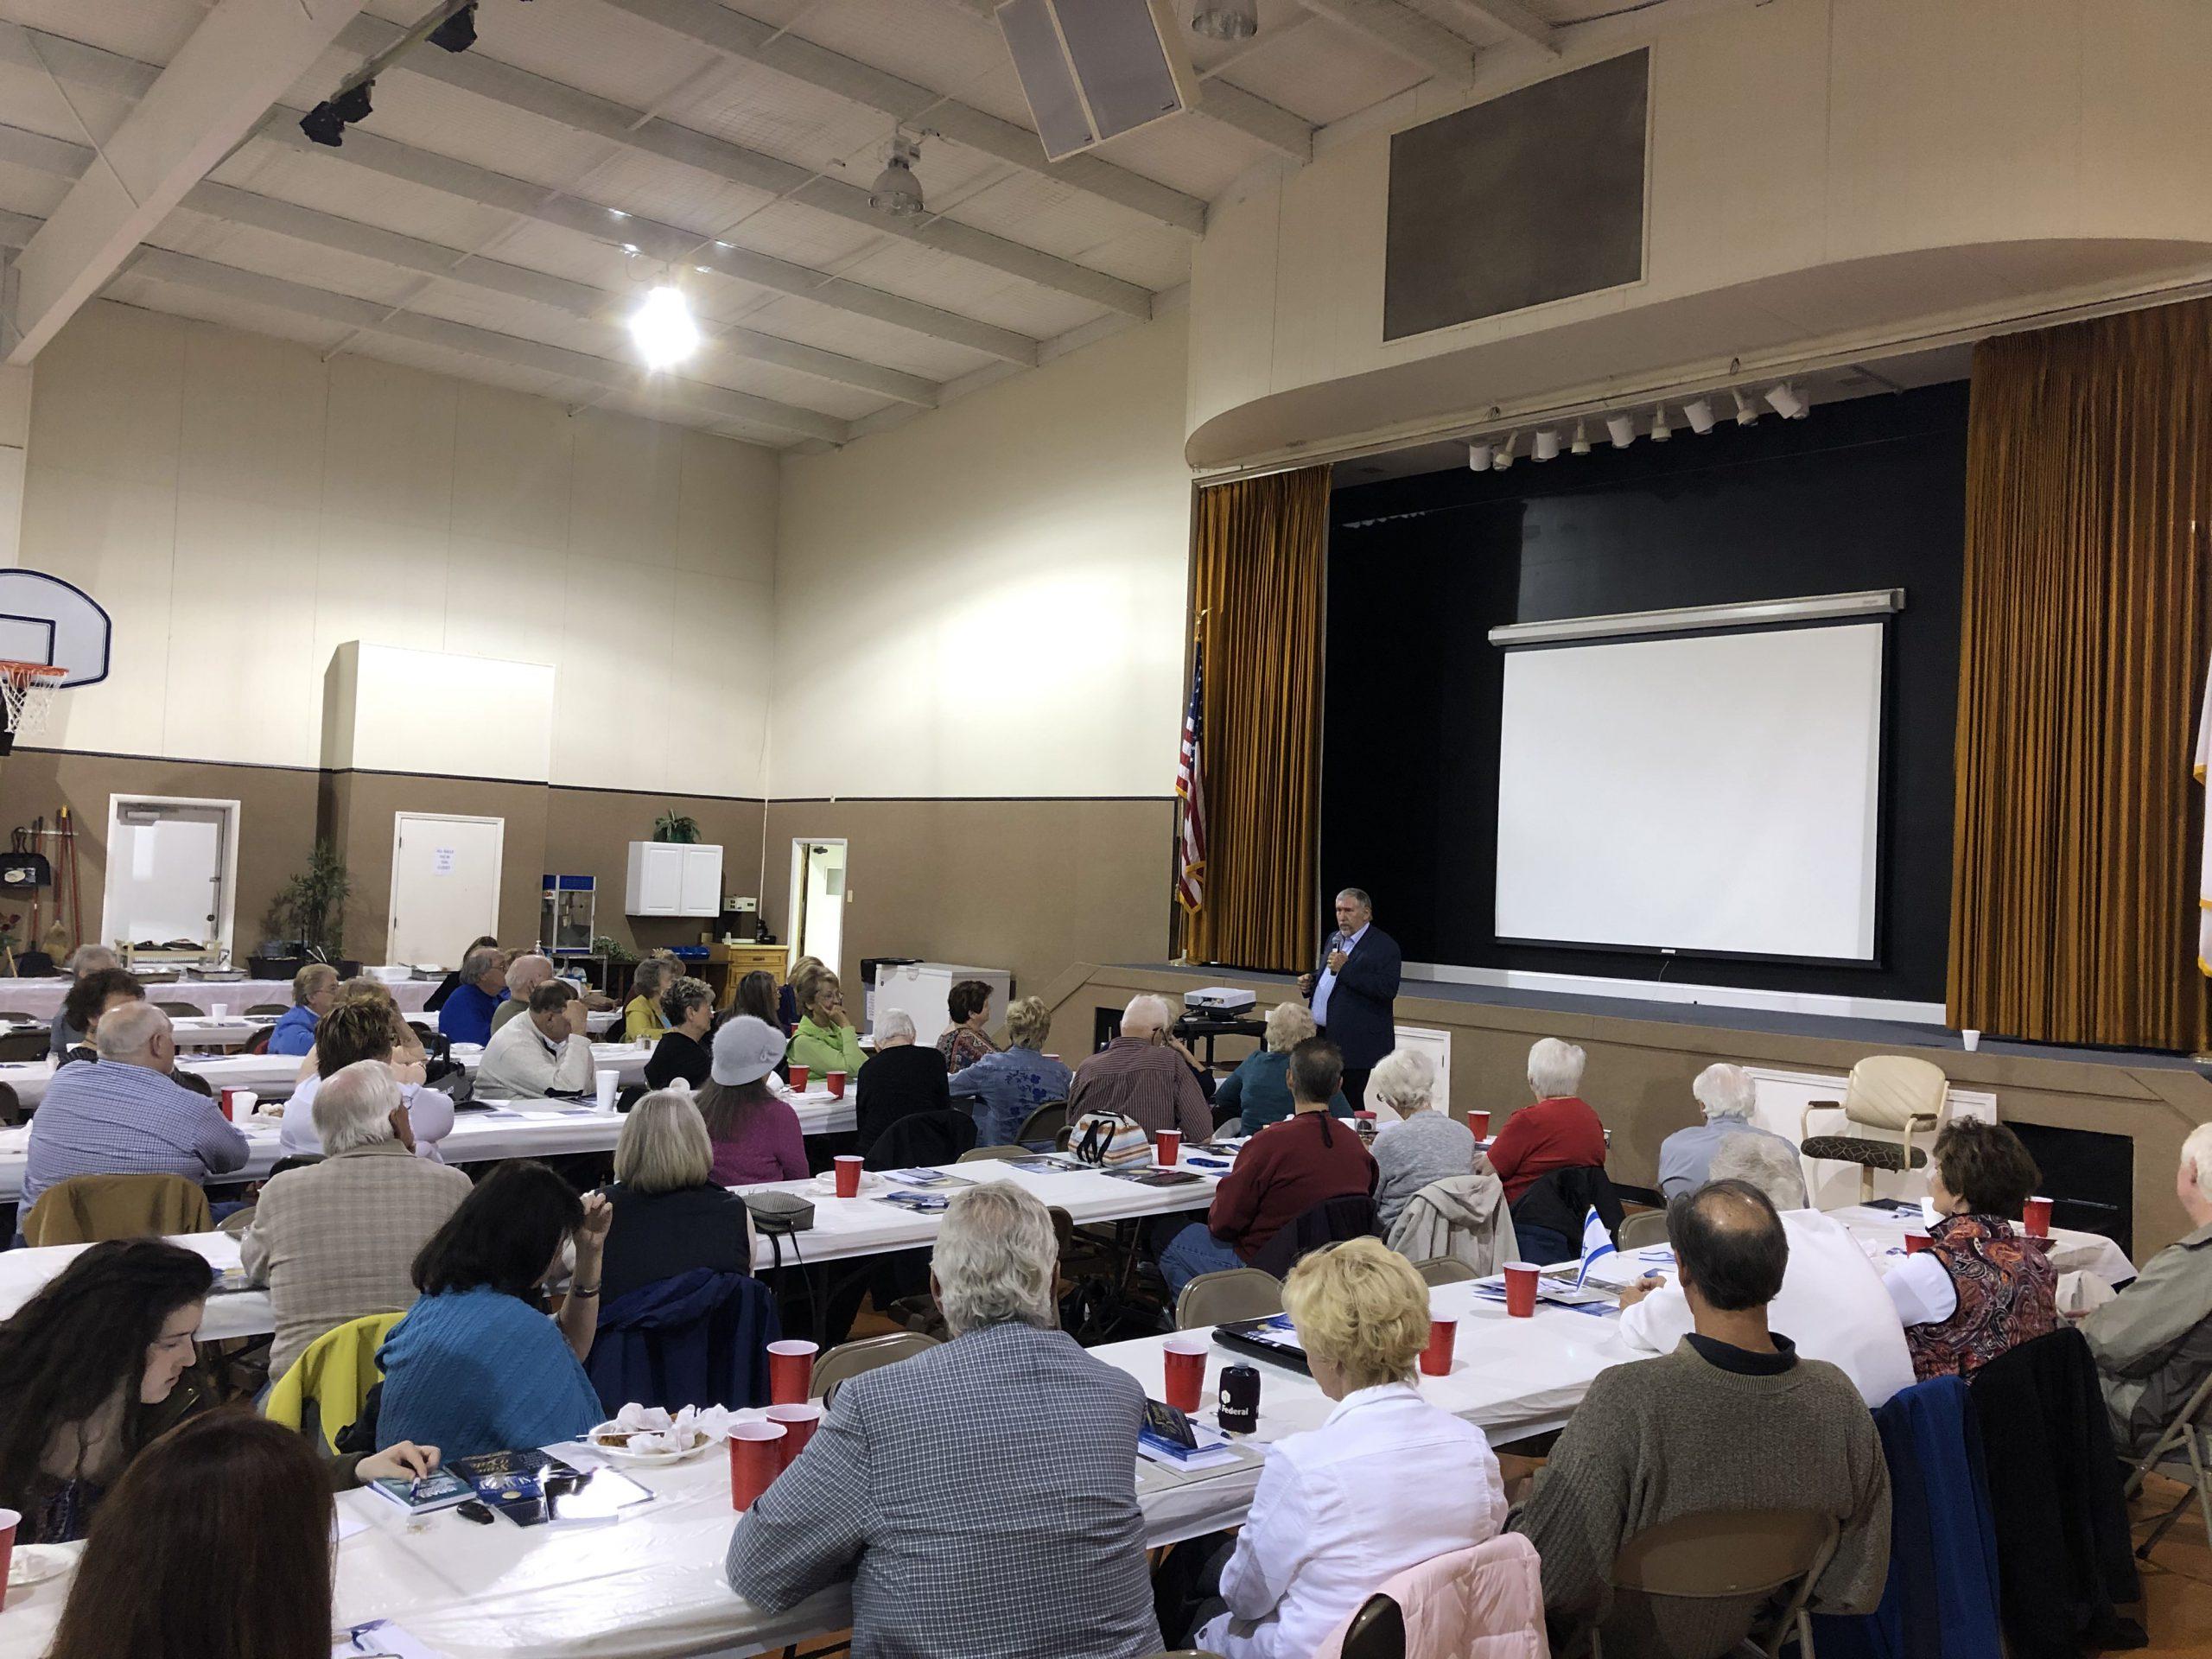 April 2 - Myrtle Beach, SC - Israel Advocacy Luncheon